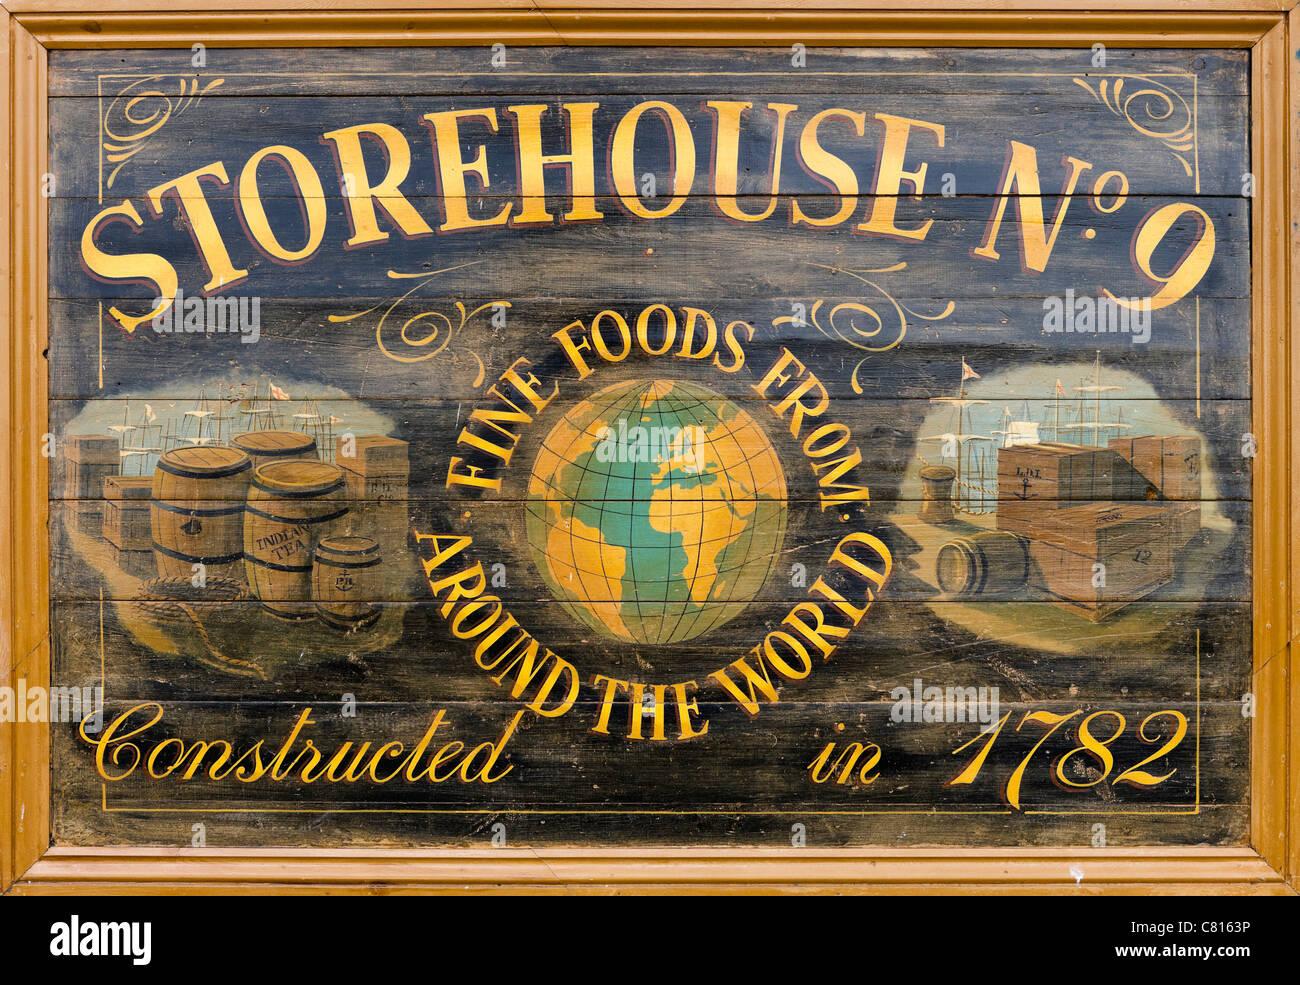 Sign for Storehouse No 9 i in Portsmouth Historic Dockyard, Portsmouth, Hampshire, England, UK - Stock Image